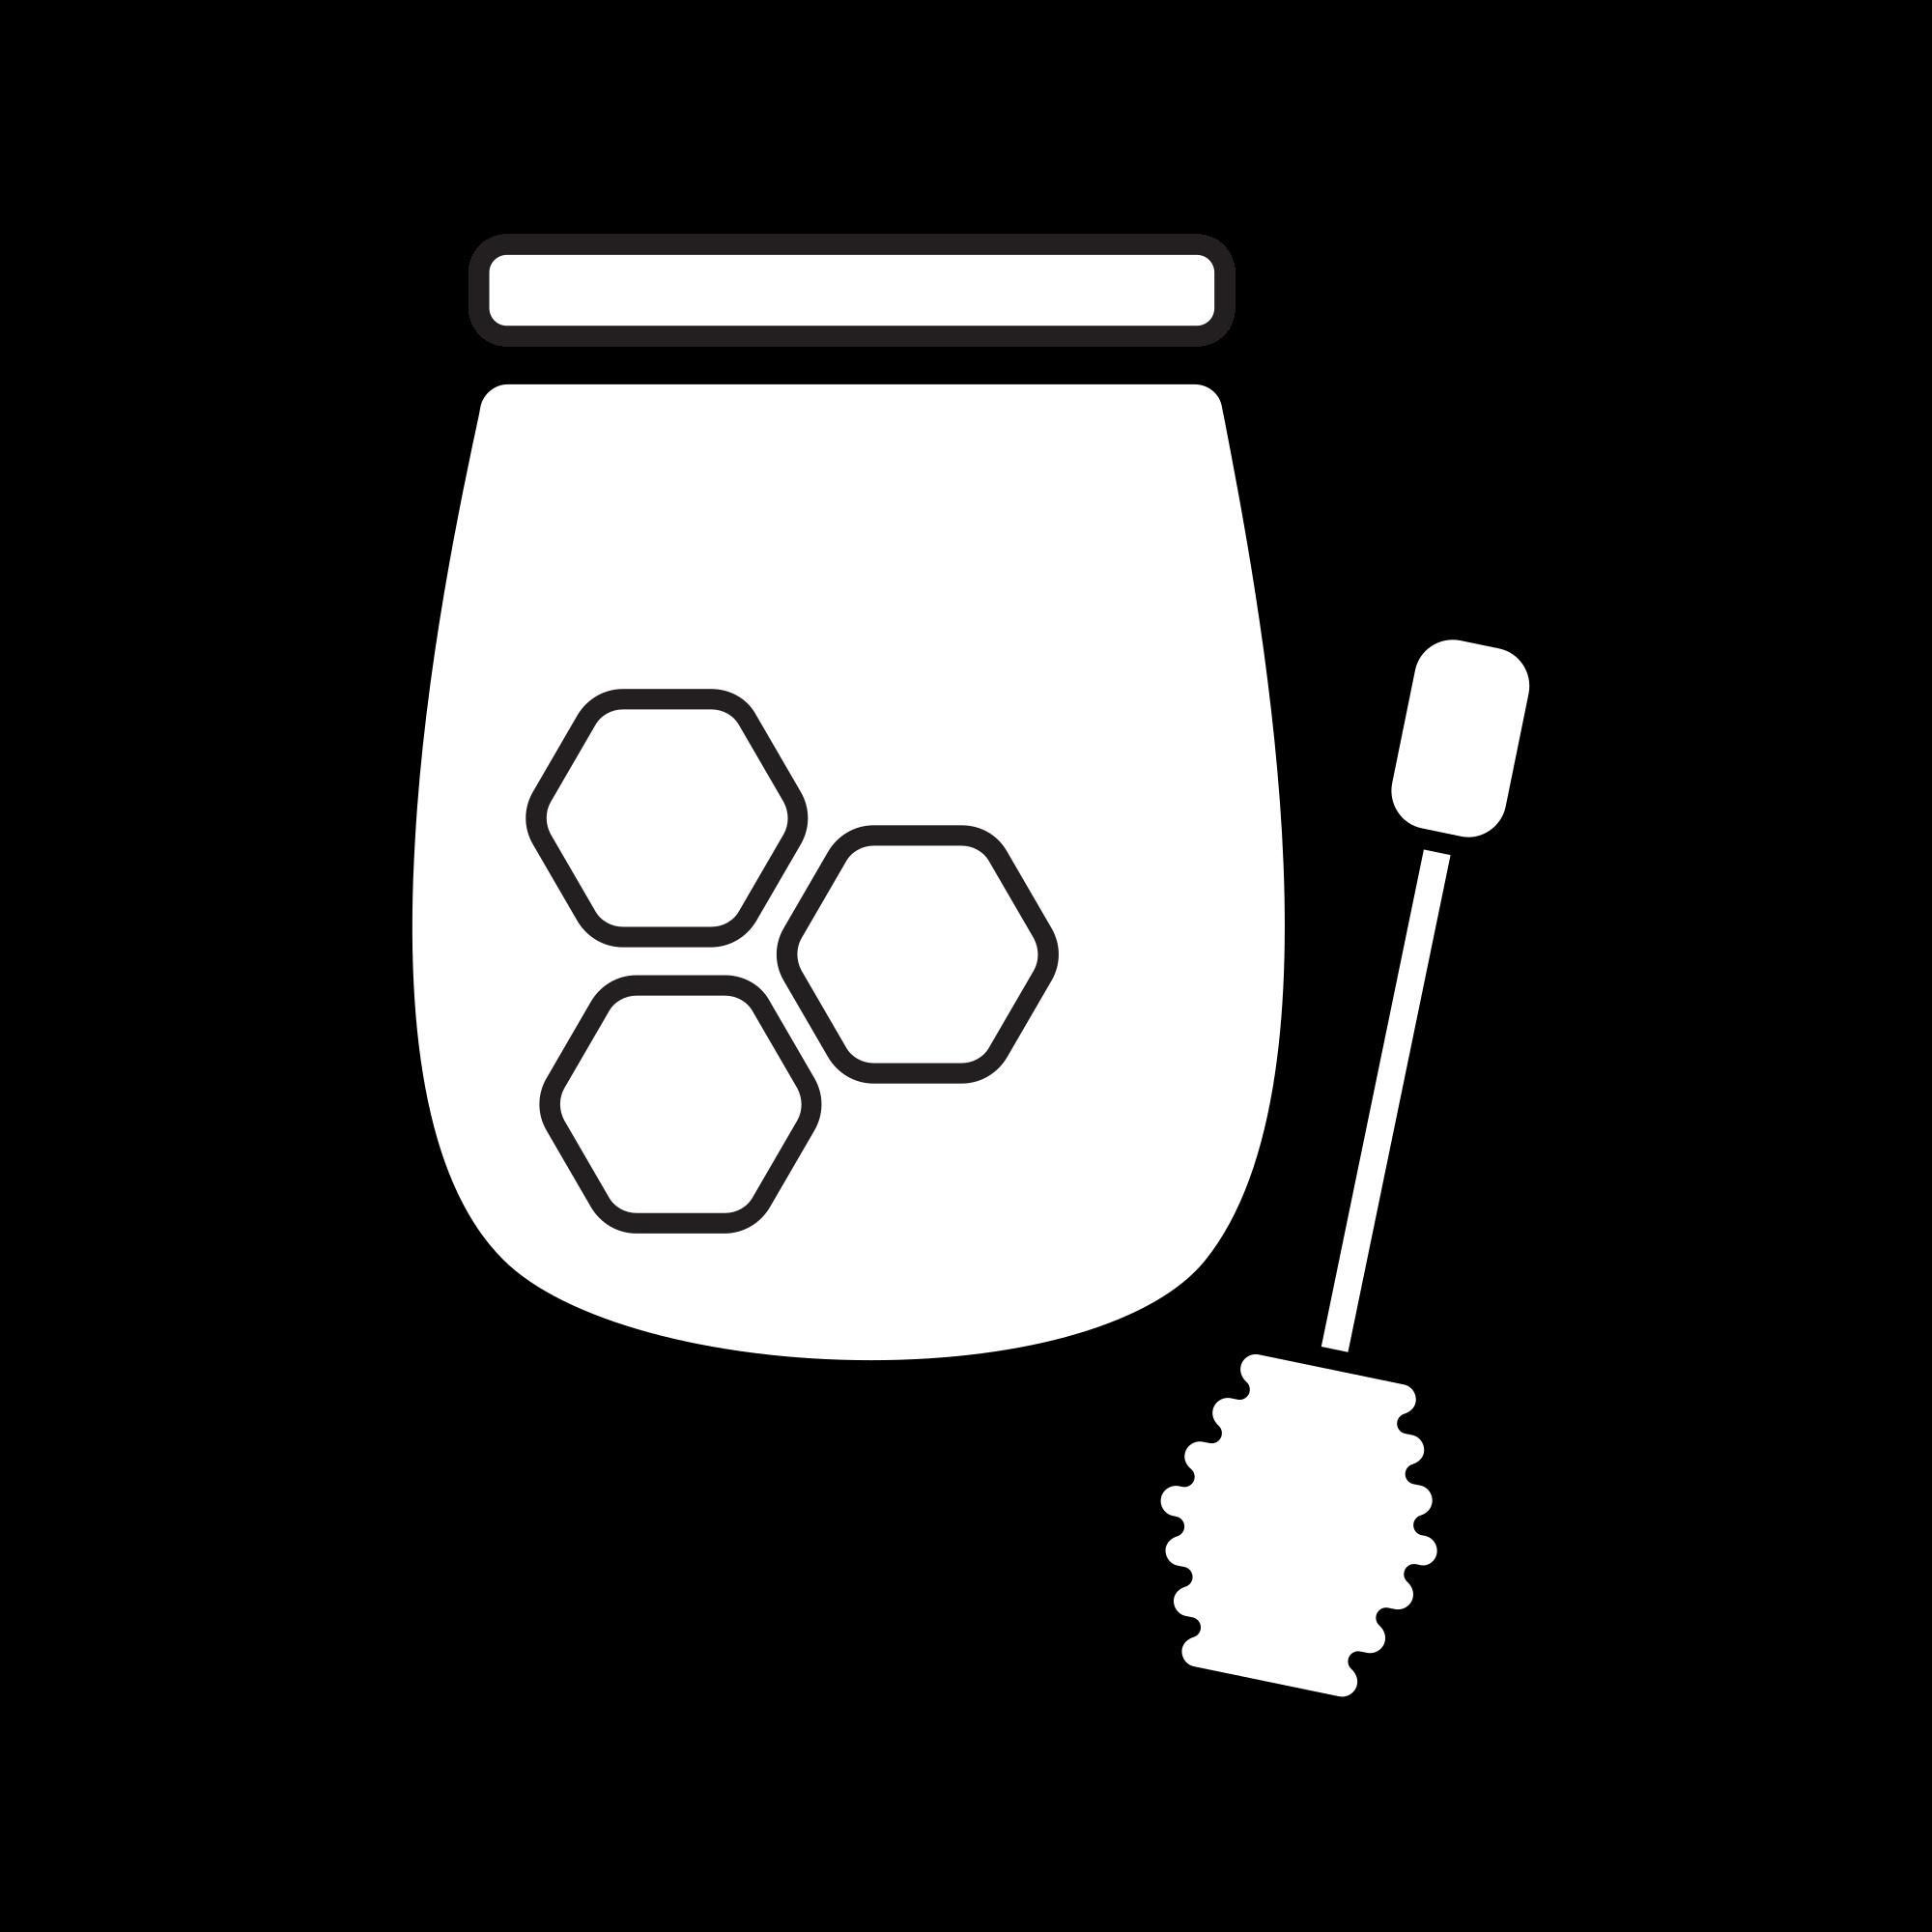 File icon white svg. Honey clipart clip art